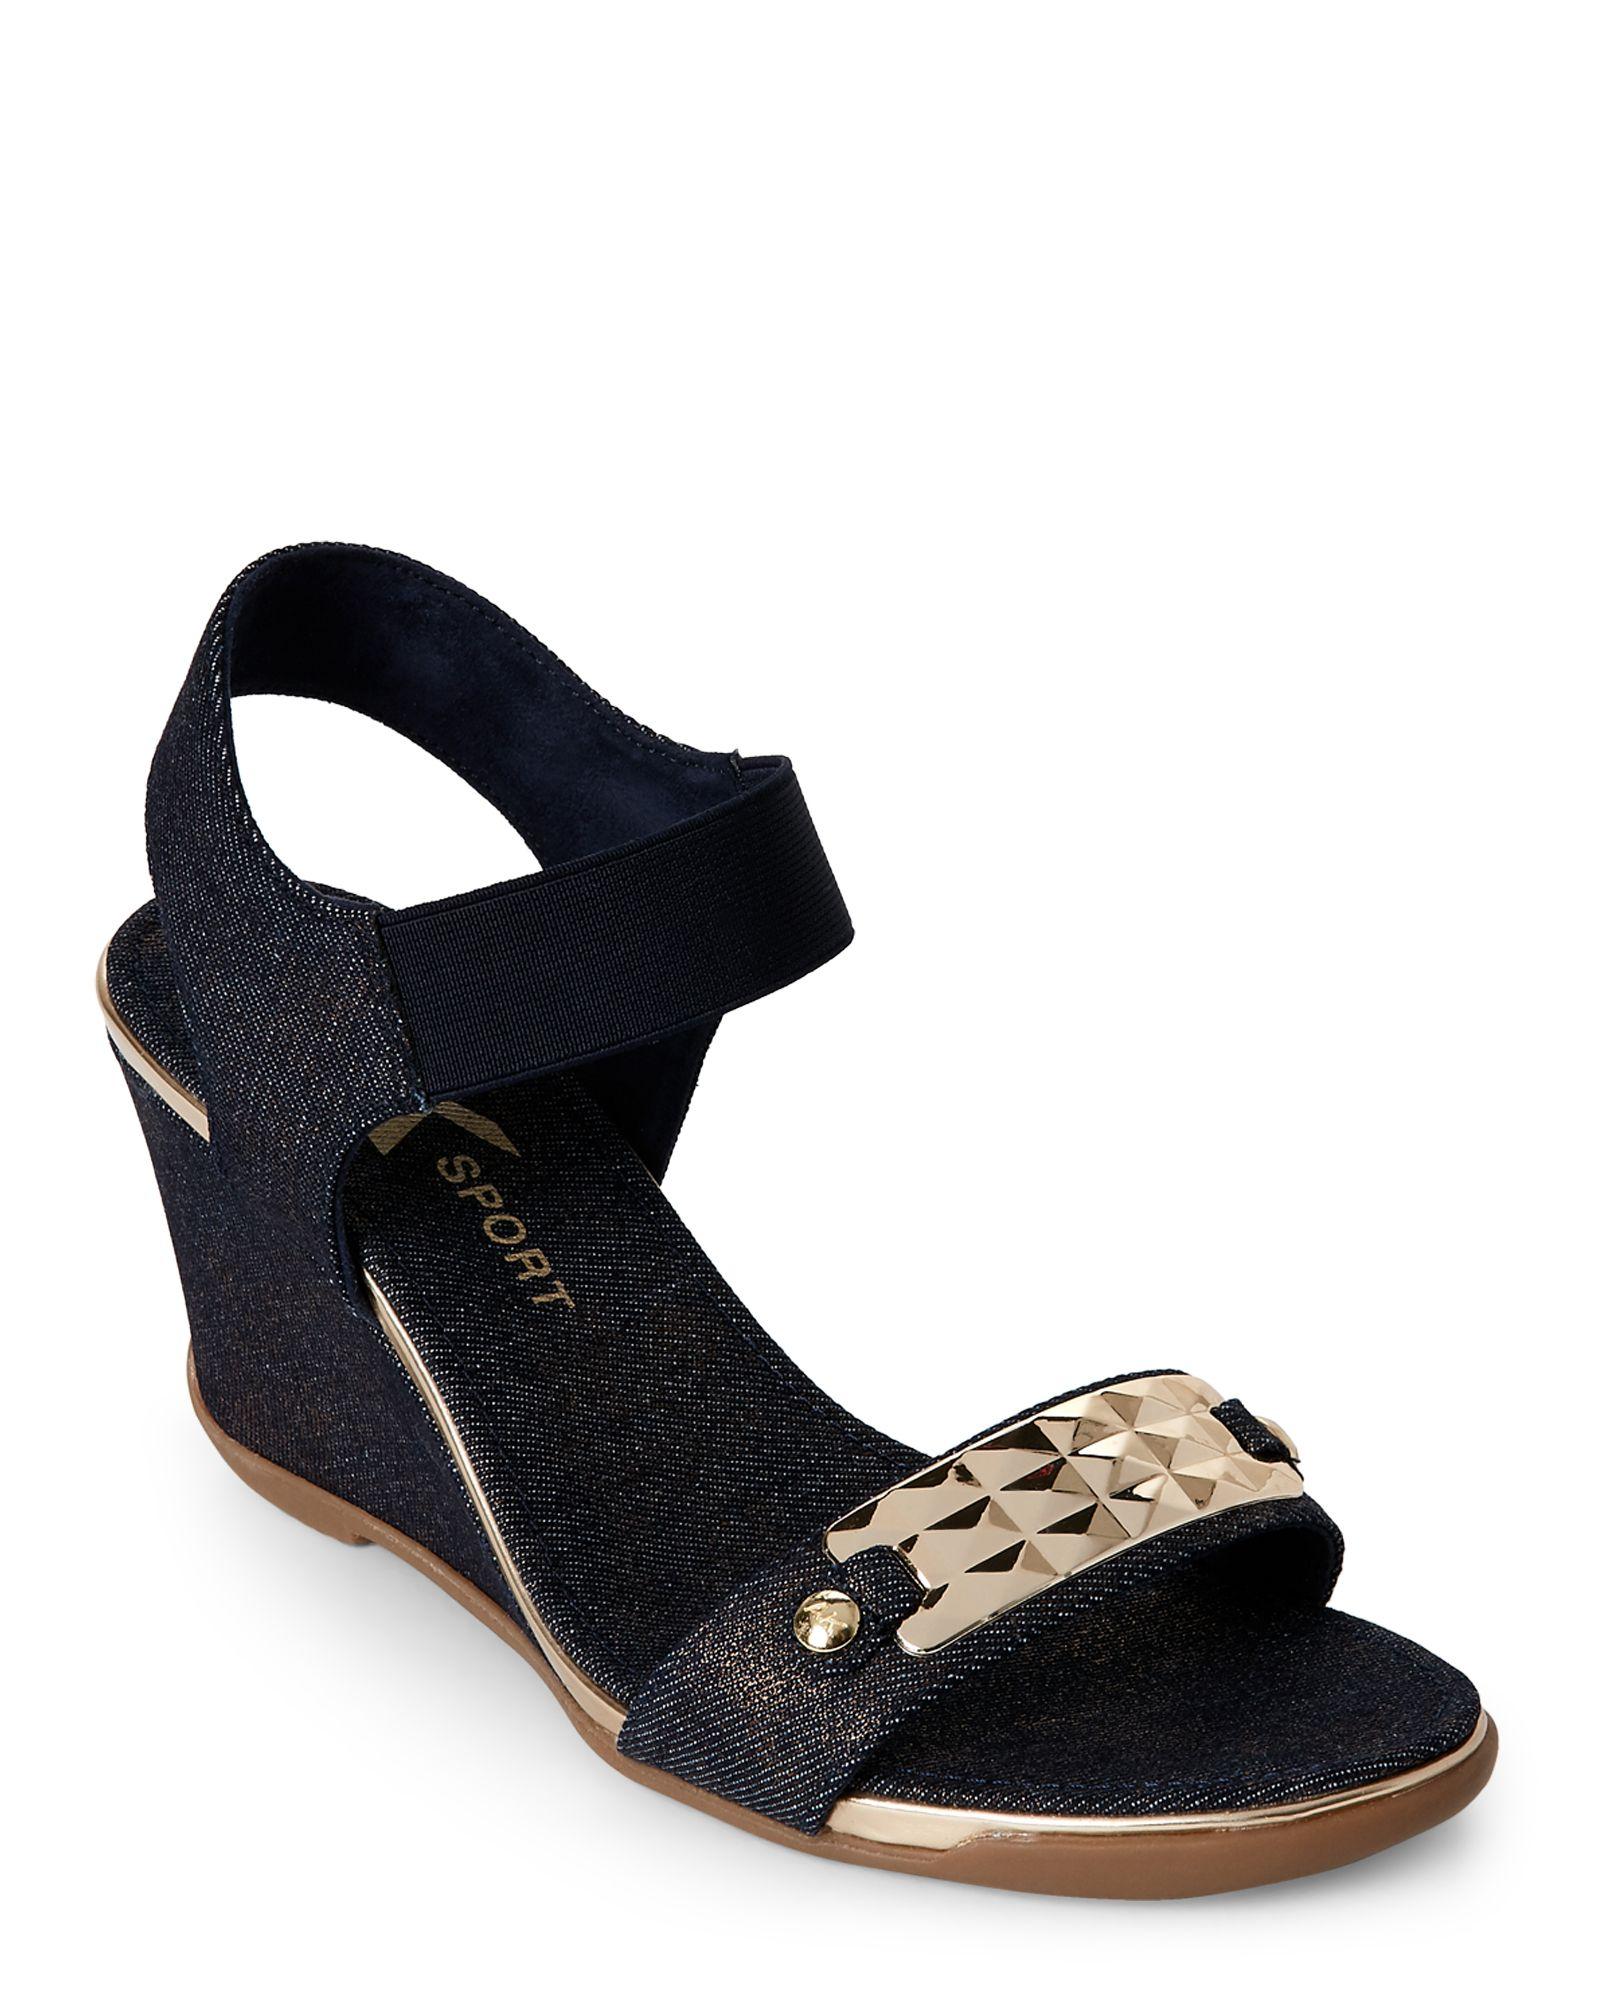 966938cc01 Ak Anne Klein Sport Denim Latasha Wedge Sandals | *Apparel ...